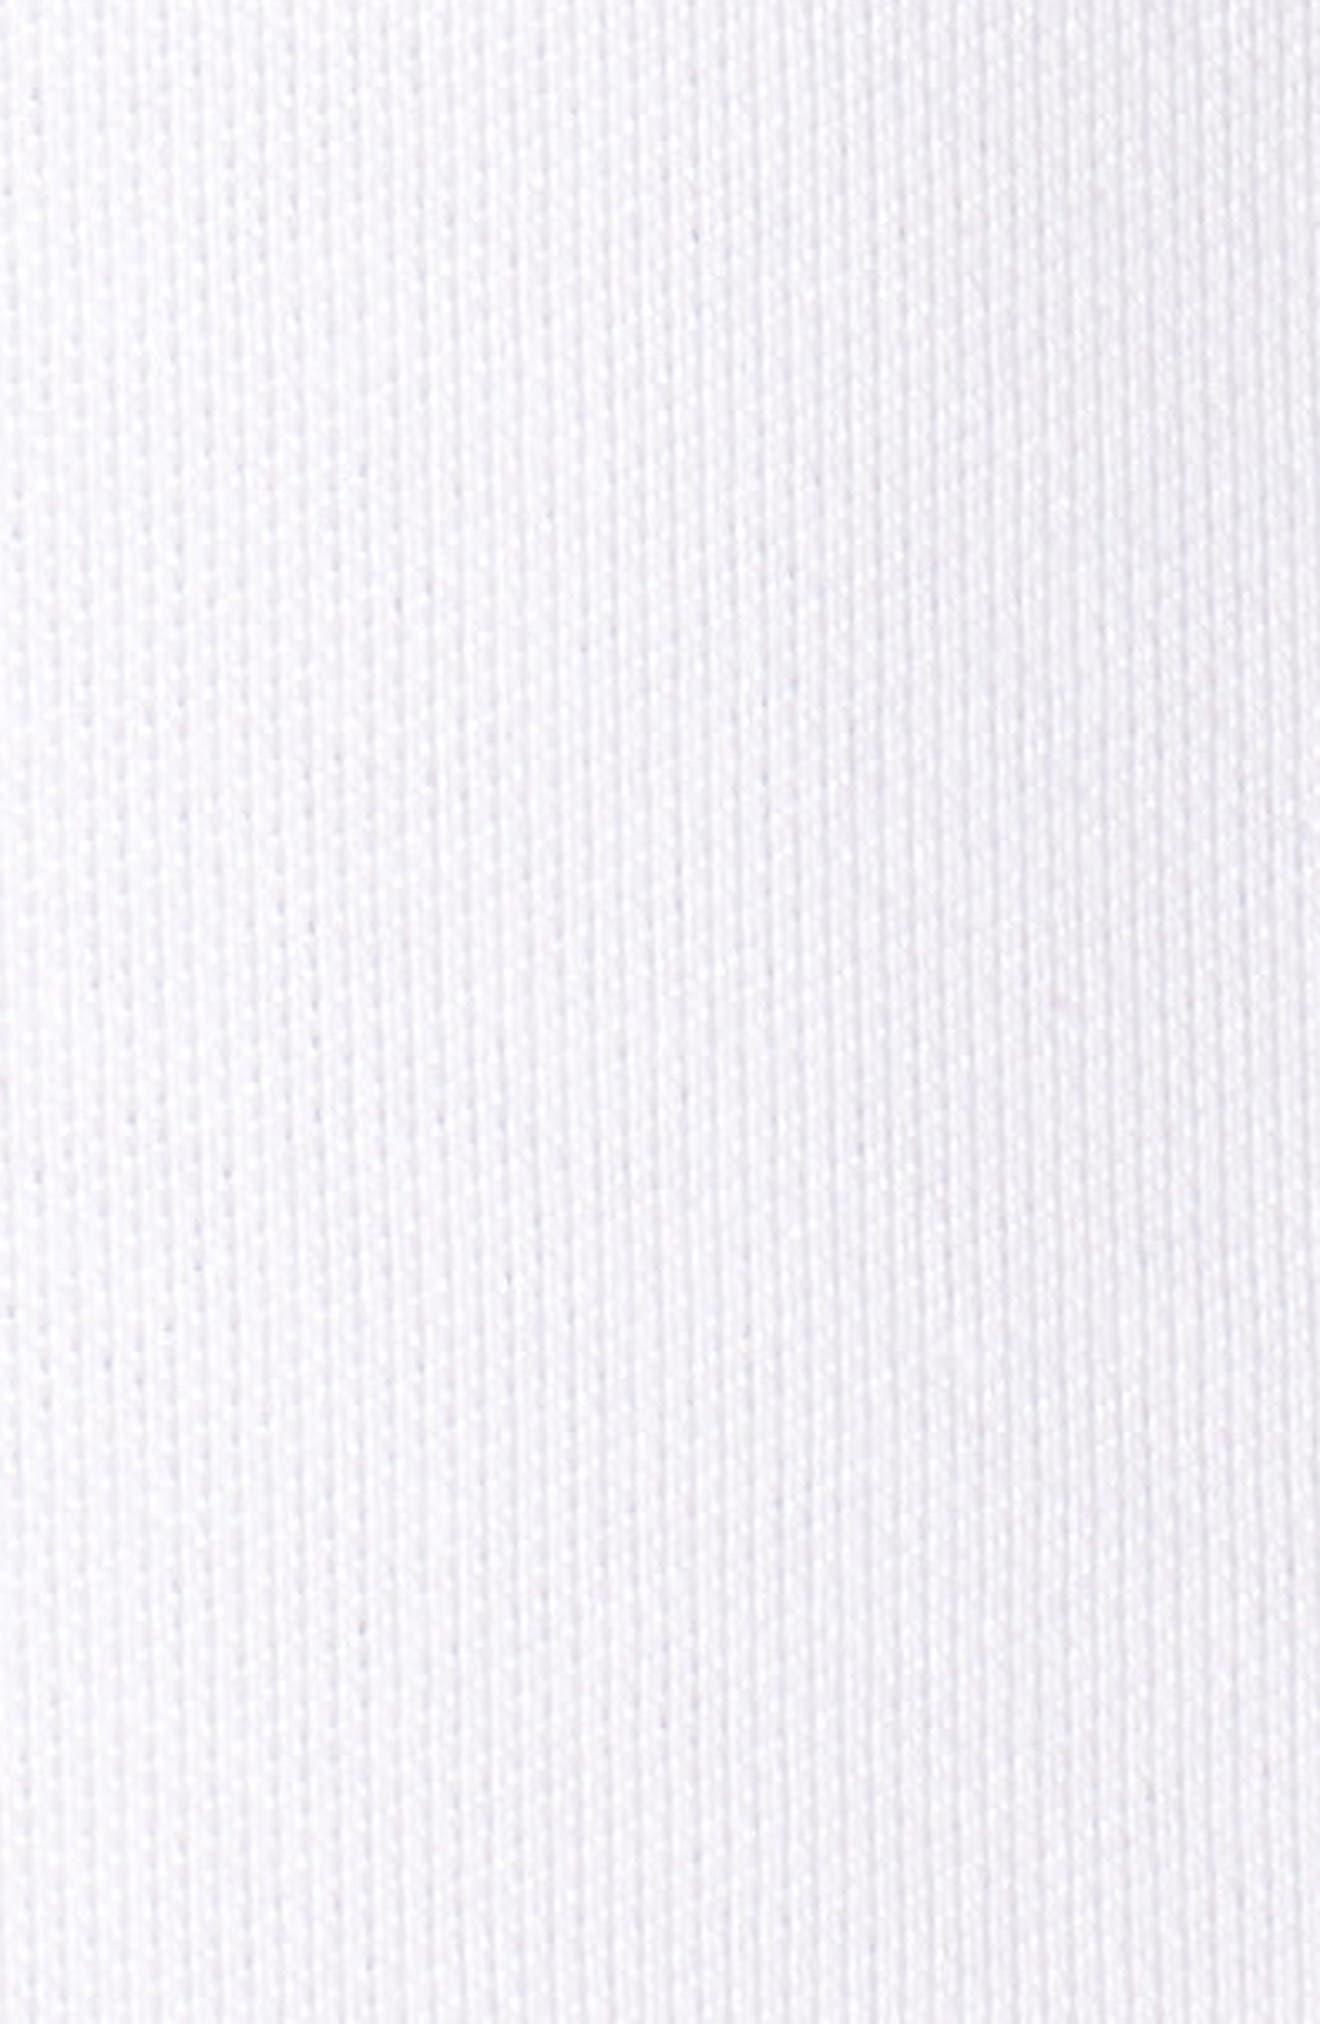 Pittsburgh Steelers - Advantage Regular Fit DryTec Polo,                             Alternate thumbnail 5, color,                             White